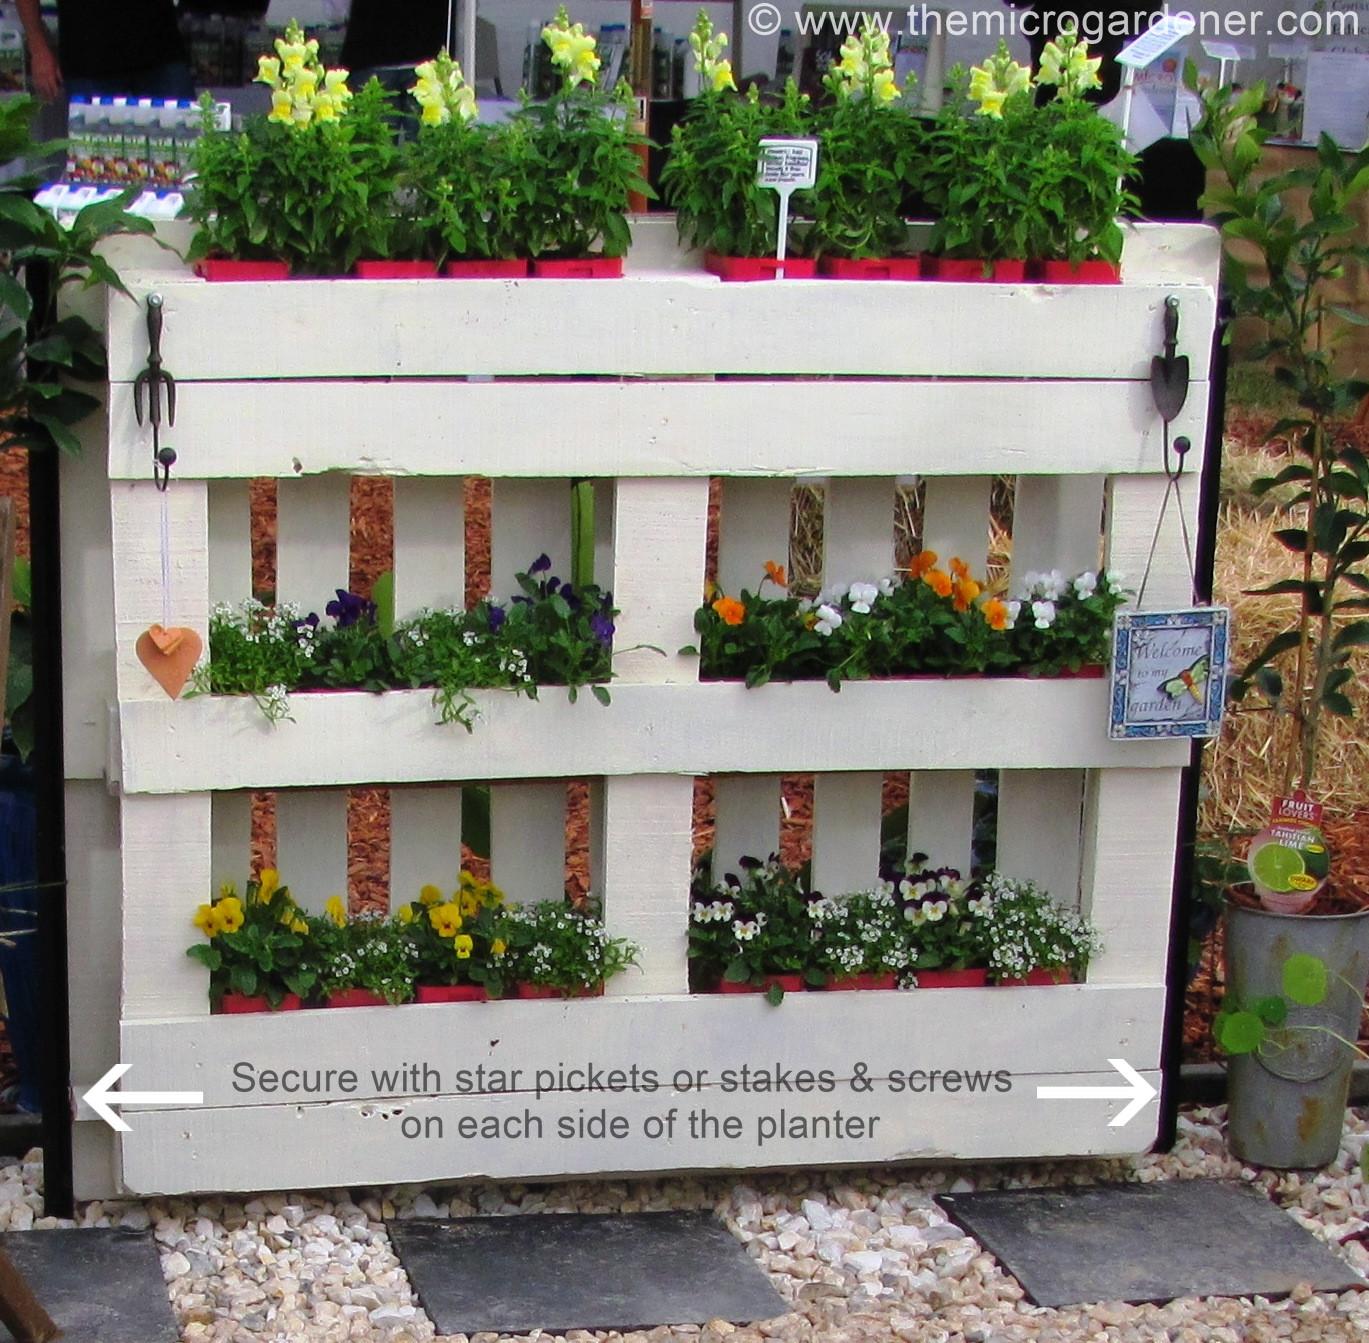 Best ideas about DIY Pallets Garden . Save or Pin DIY Pallet Planter Now.